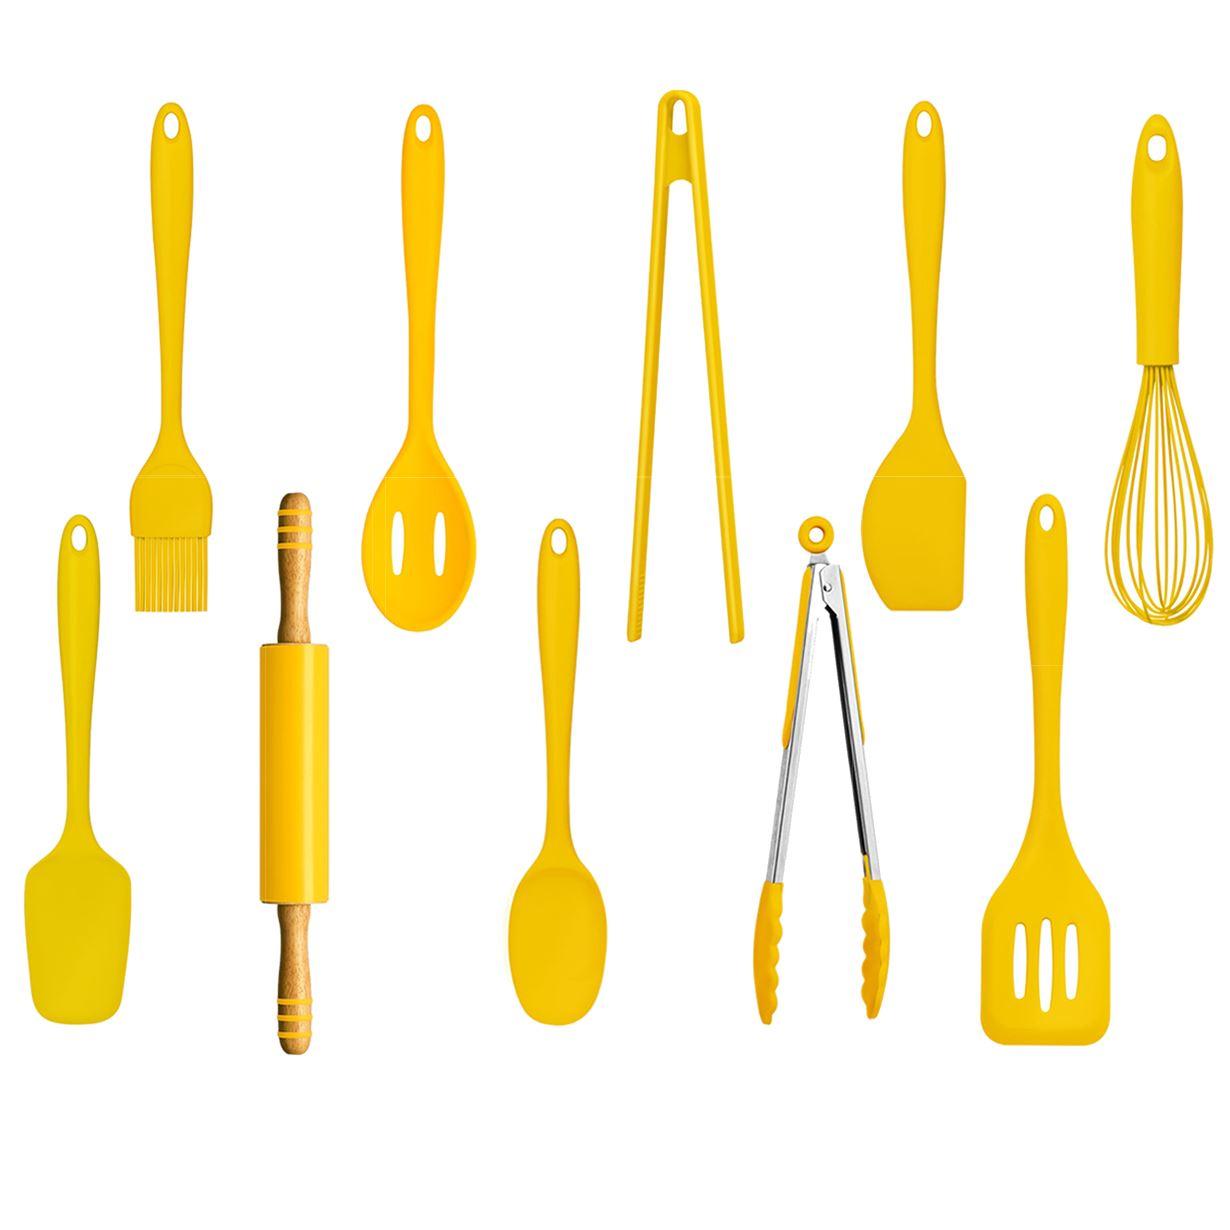 Exceptionnel Zing Cooking Utensils 10pc Kitchen Accessories Set Heat